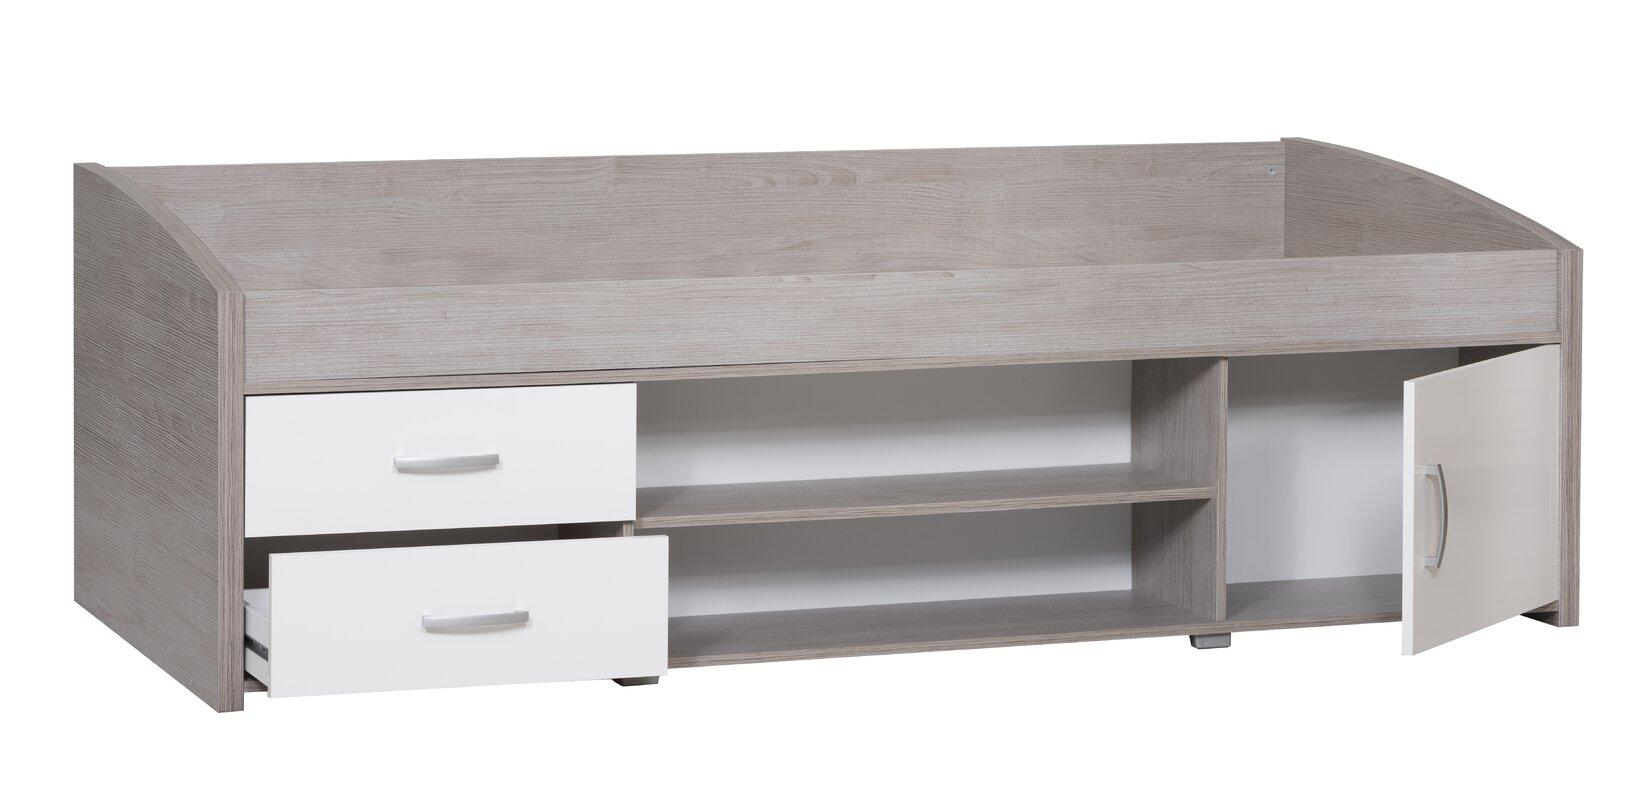 true furniture bett yanniek 90 x 200 cm bewertungen. Black Bedroom Furniture Sets. Home Design Ideas